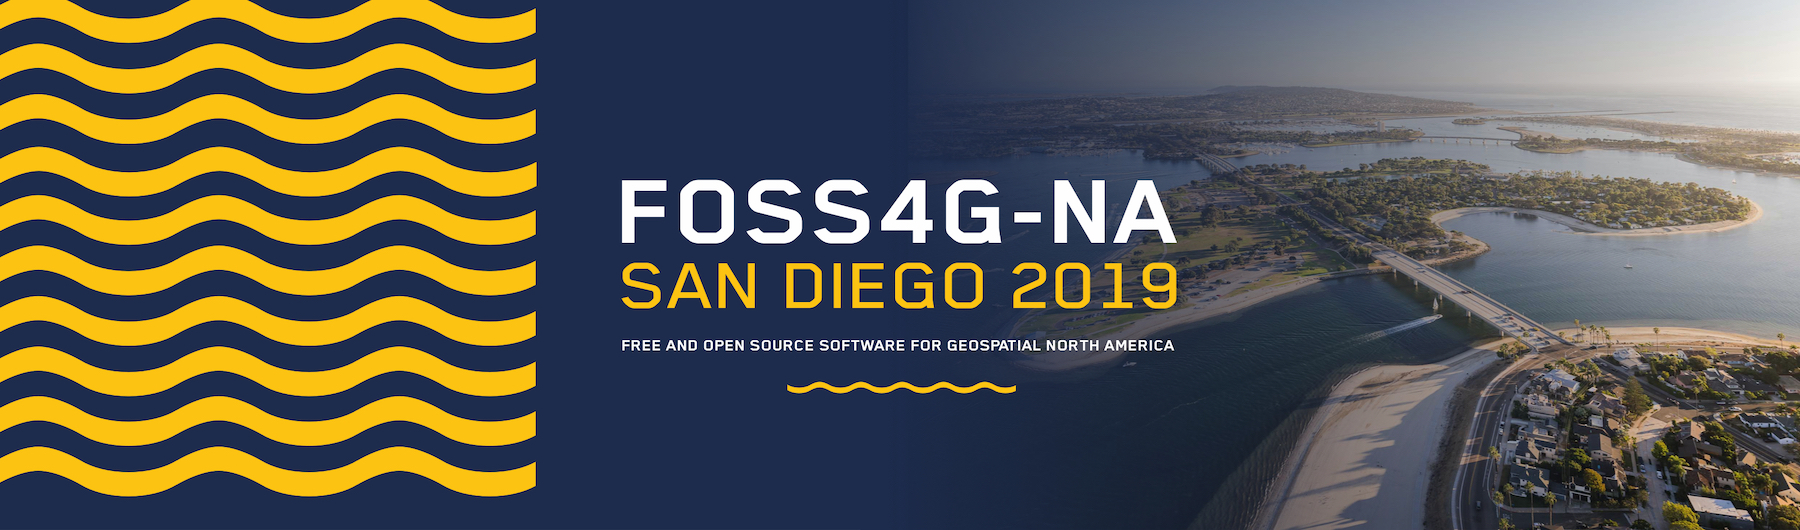 FOSS4G-NA 2019 San Diego